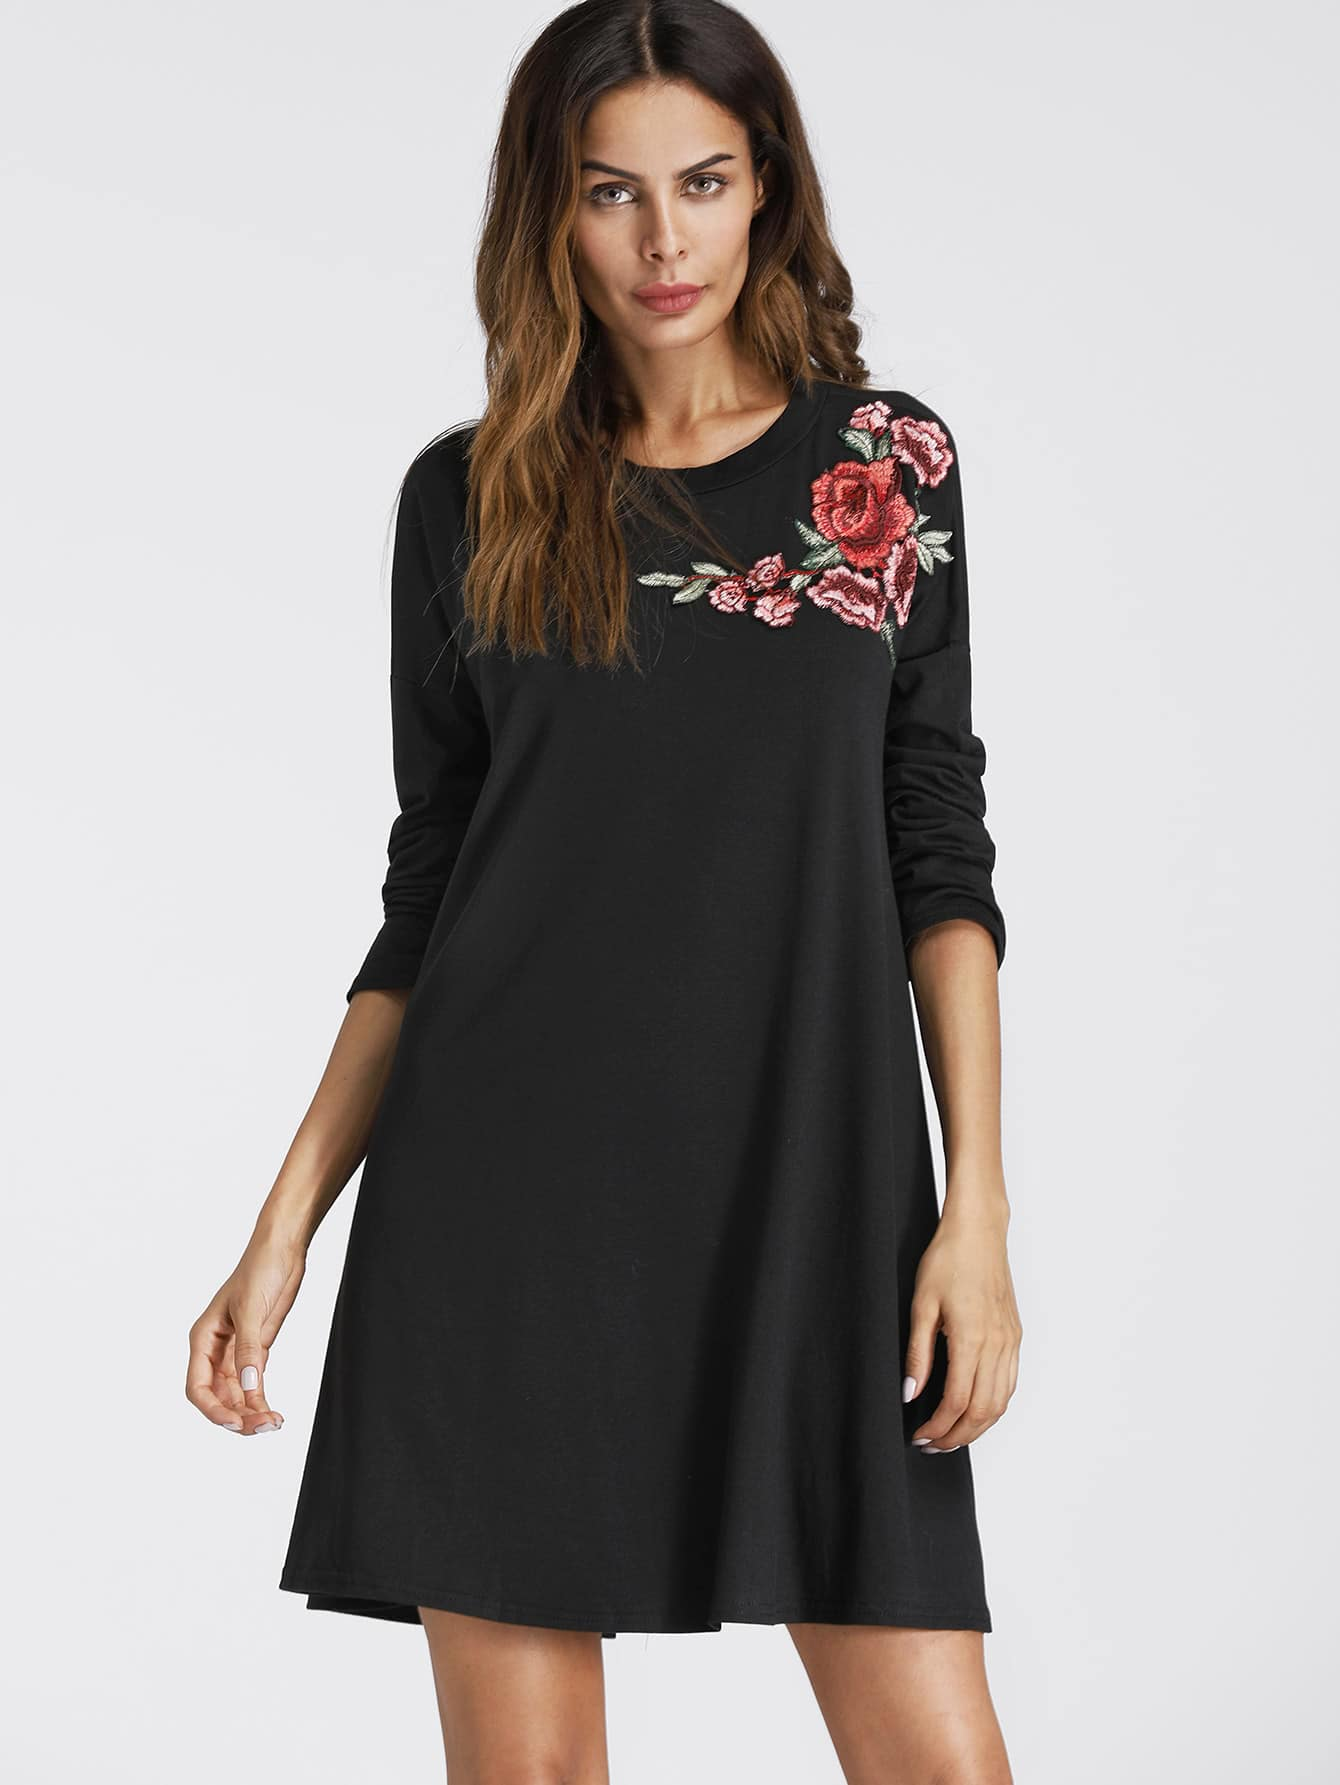 Embroidered Rose Applique Shift Dress embroidered rose applique side split belt dress